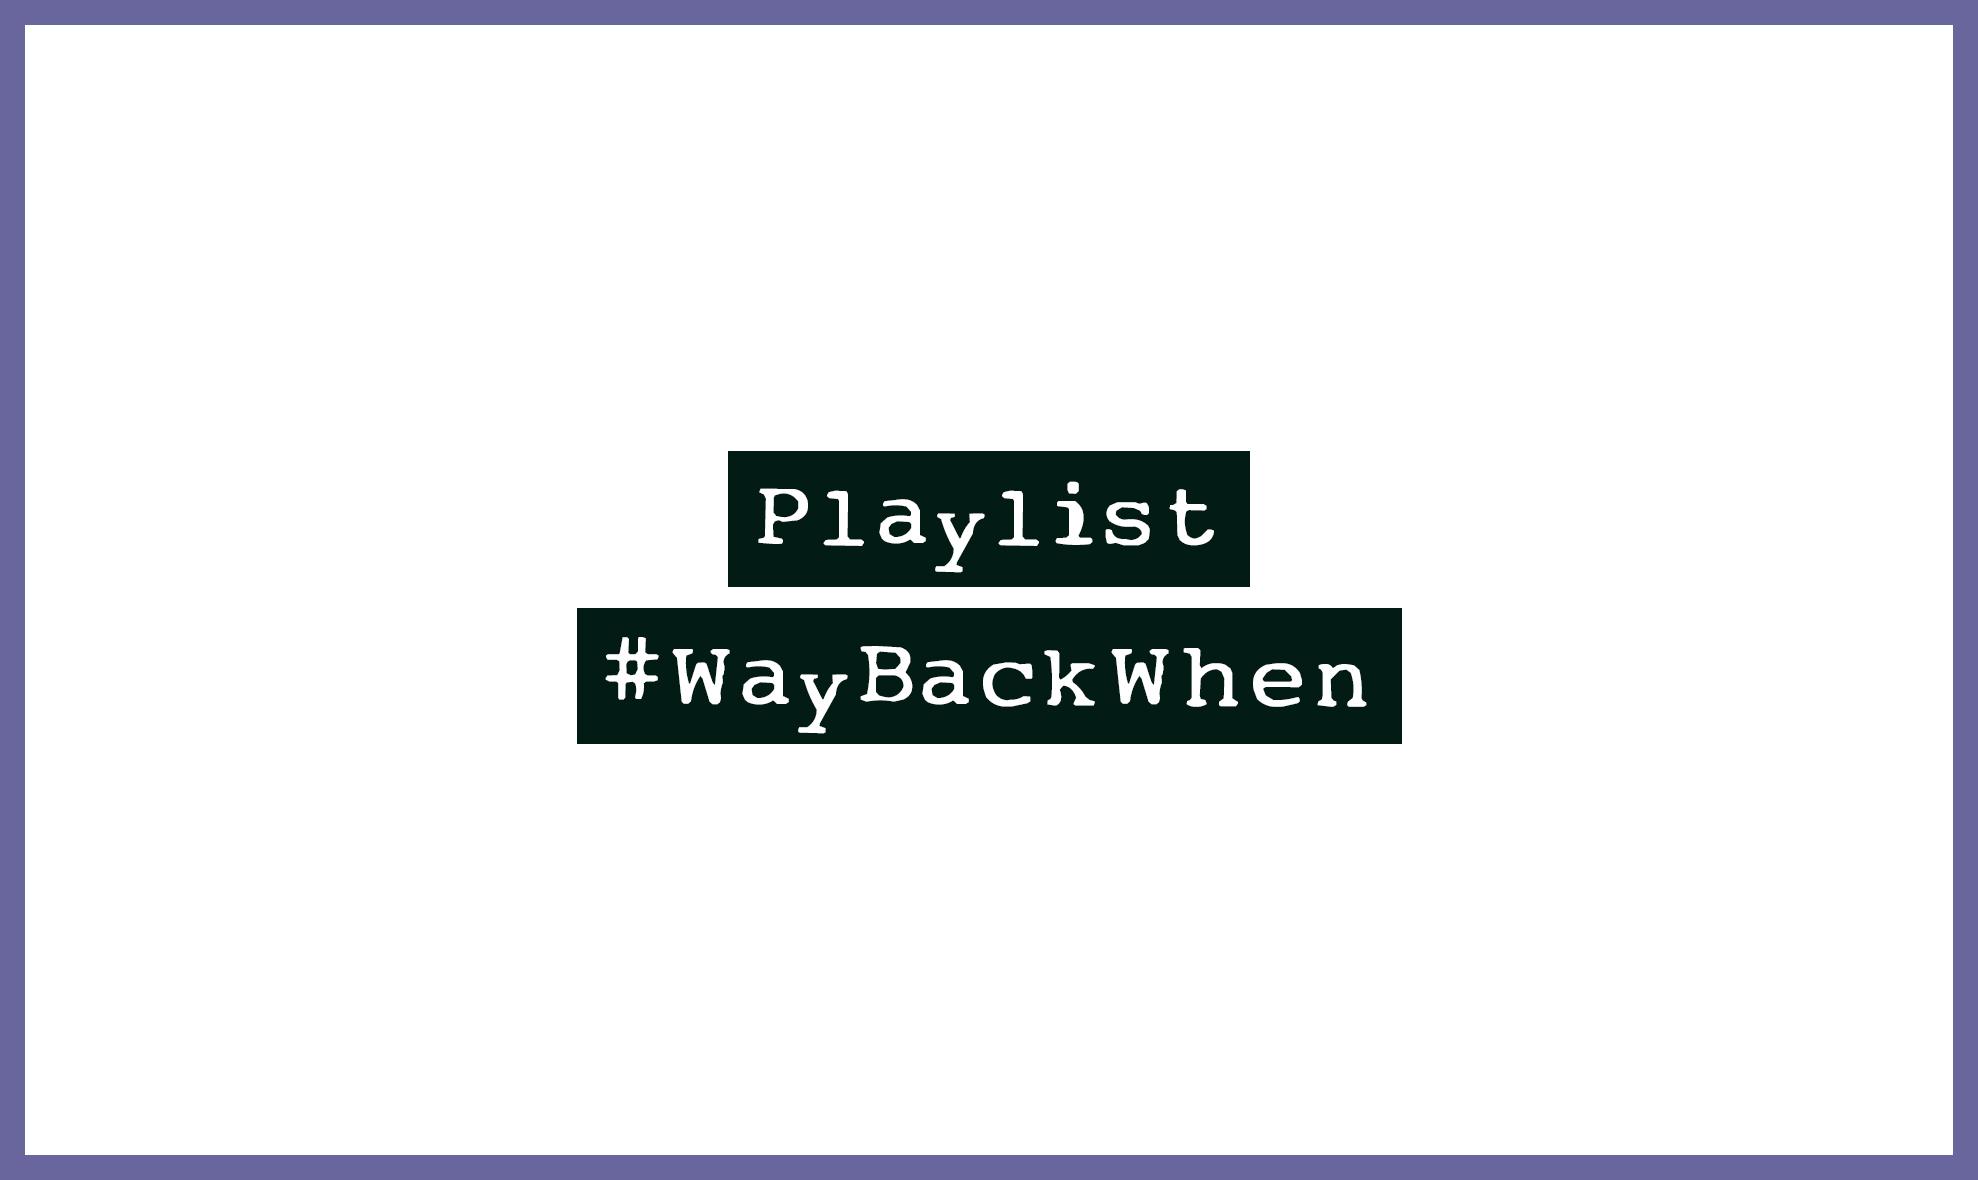 Playlist zum Festival #WayBackWhen